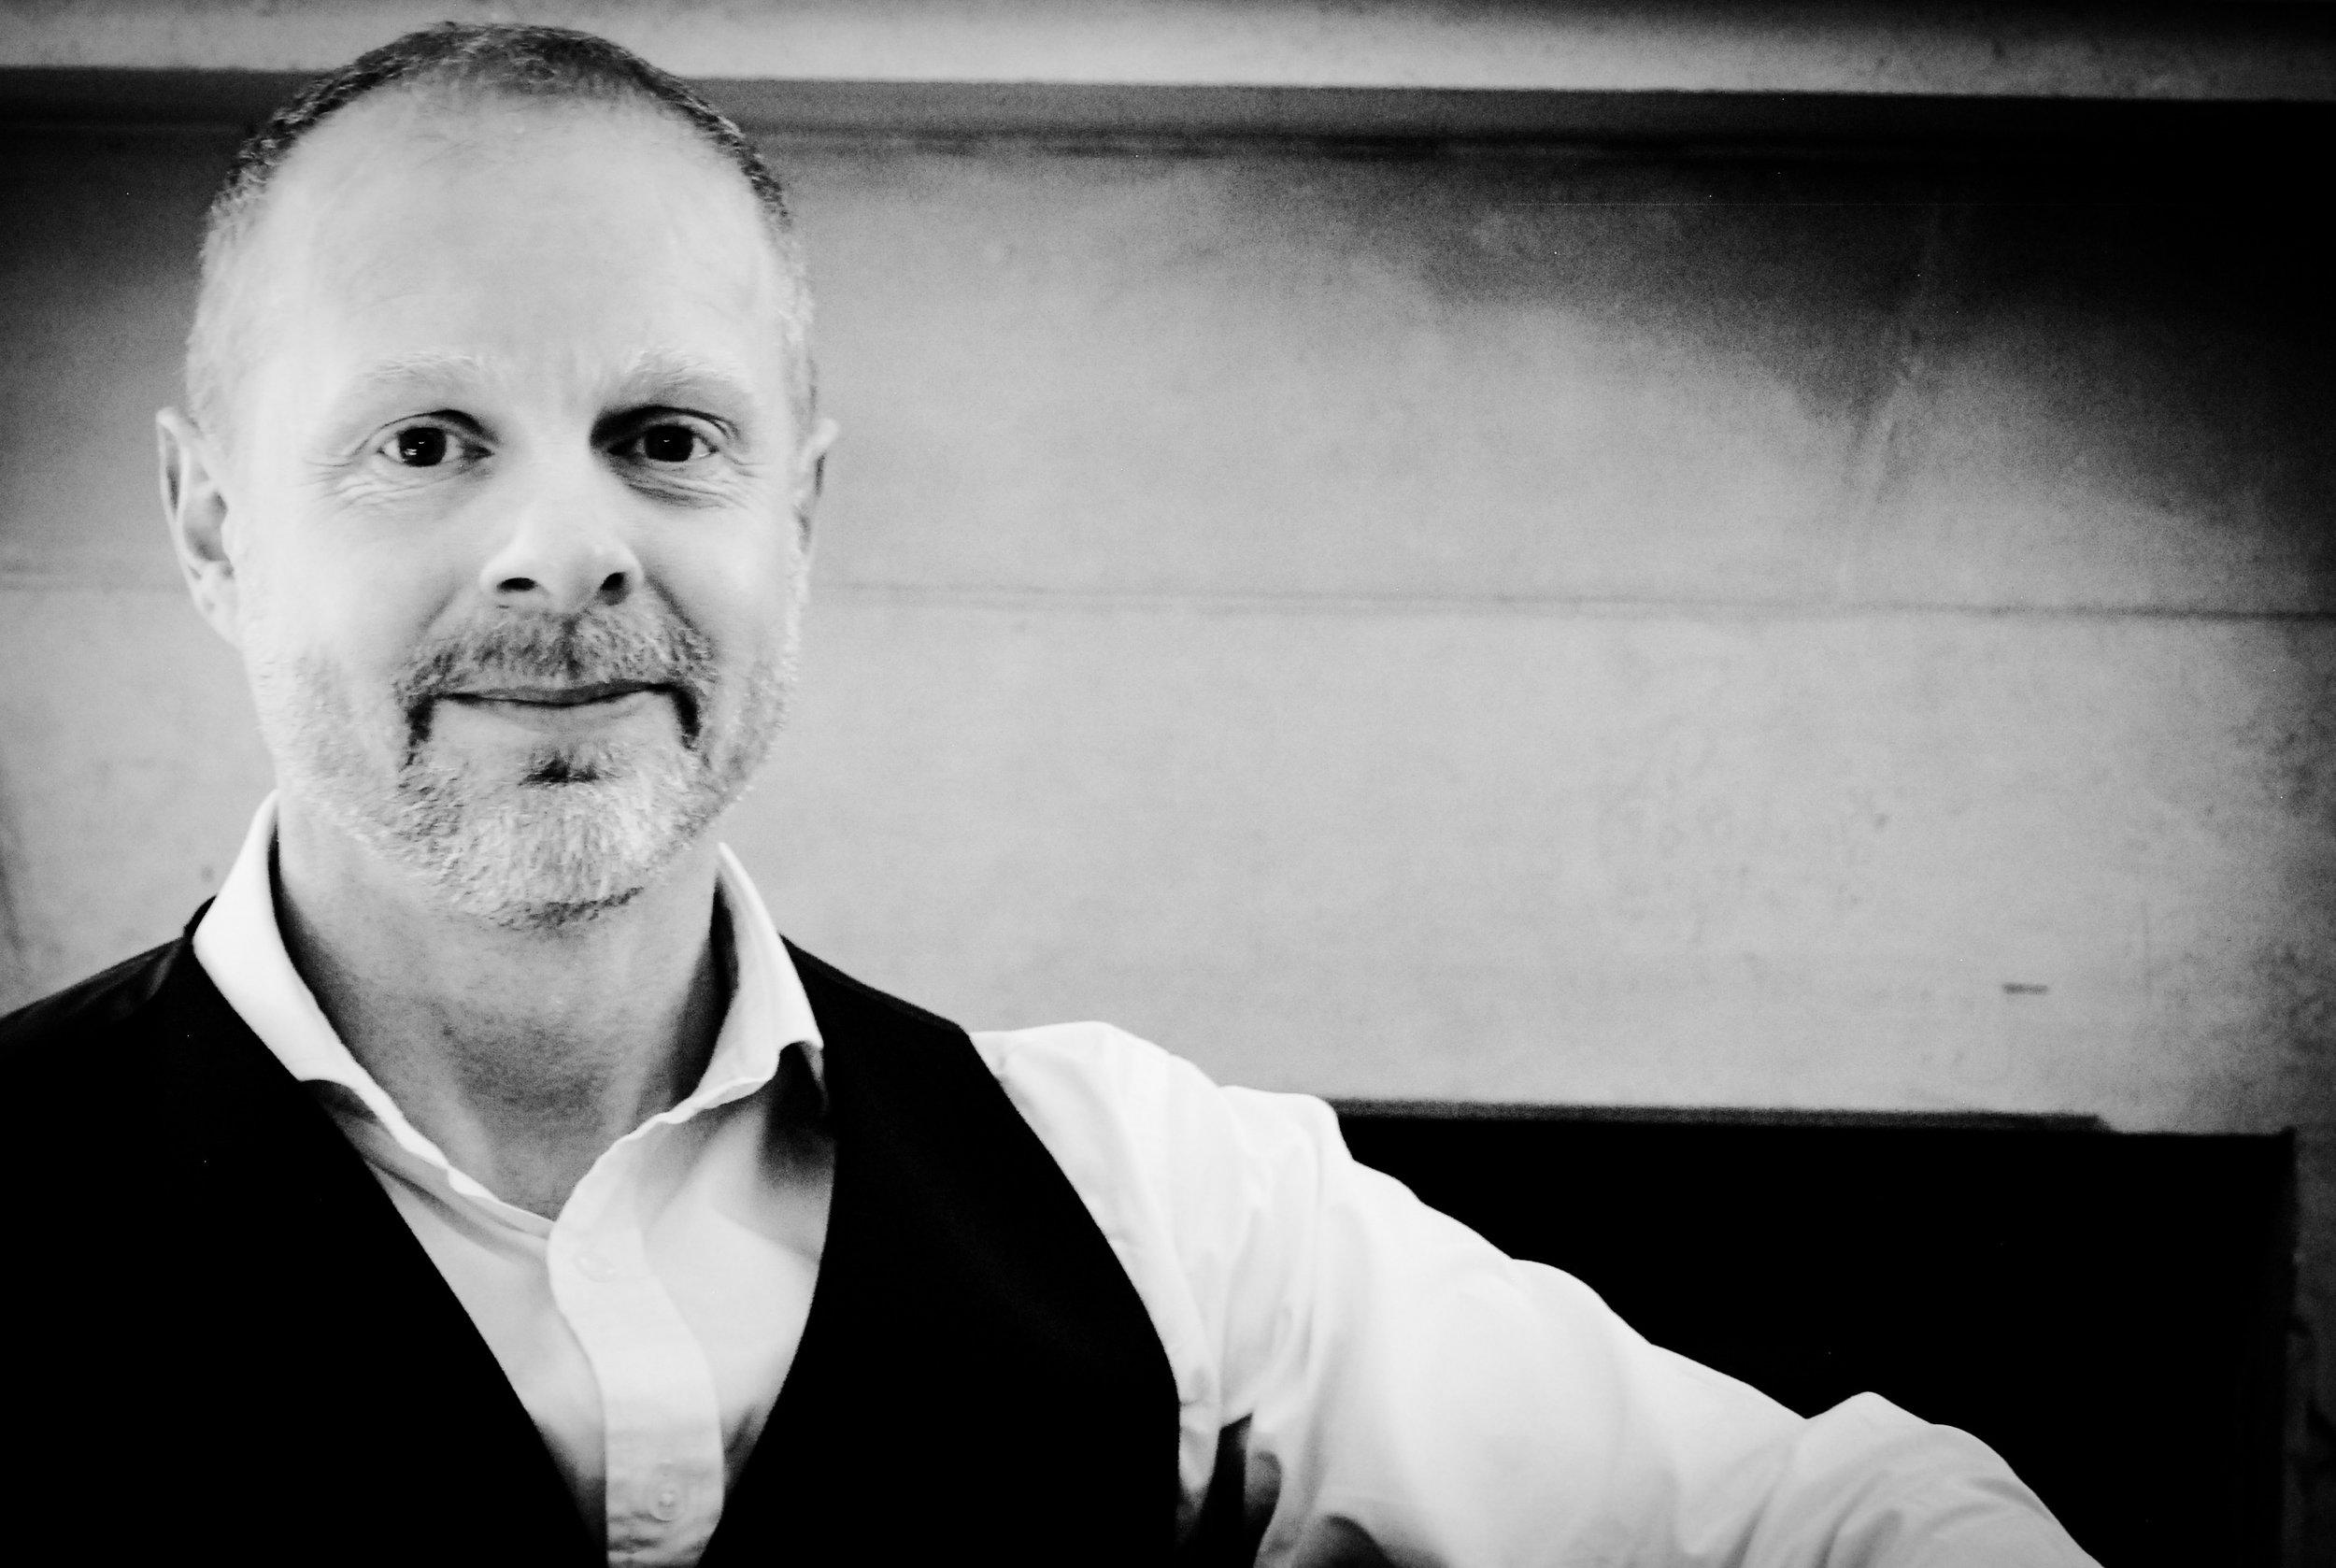 Jason Garth Edwards - Director and head of design